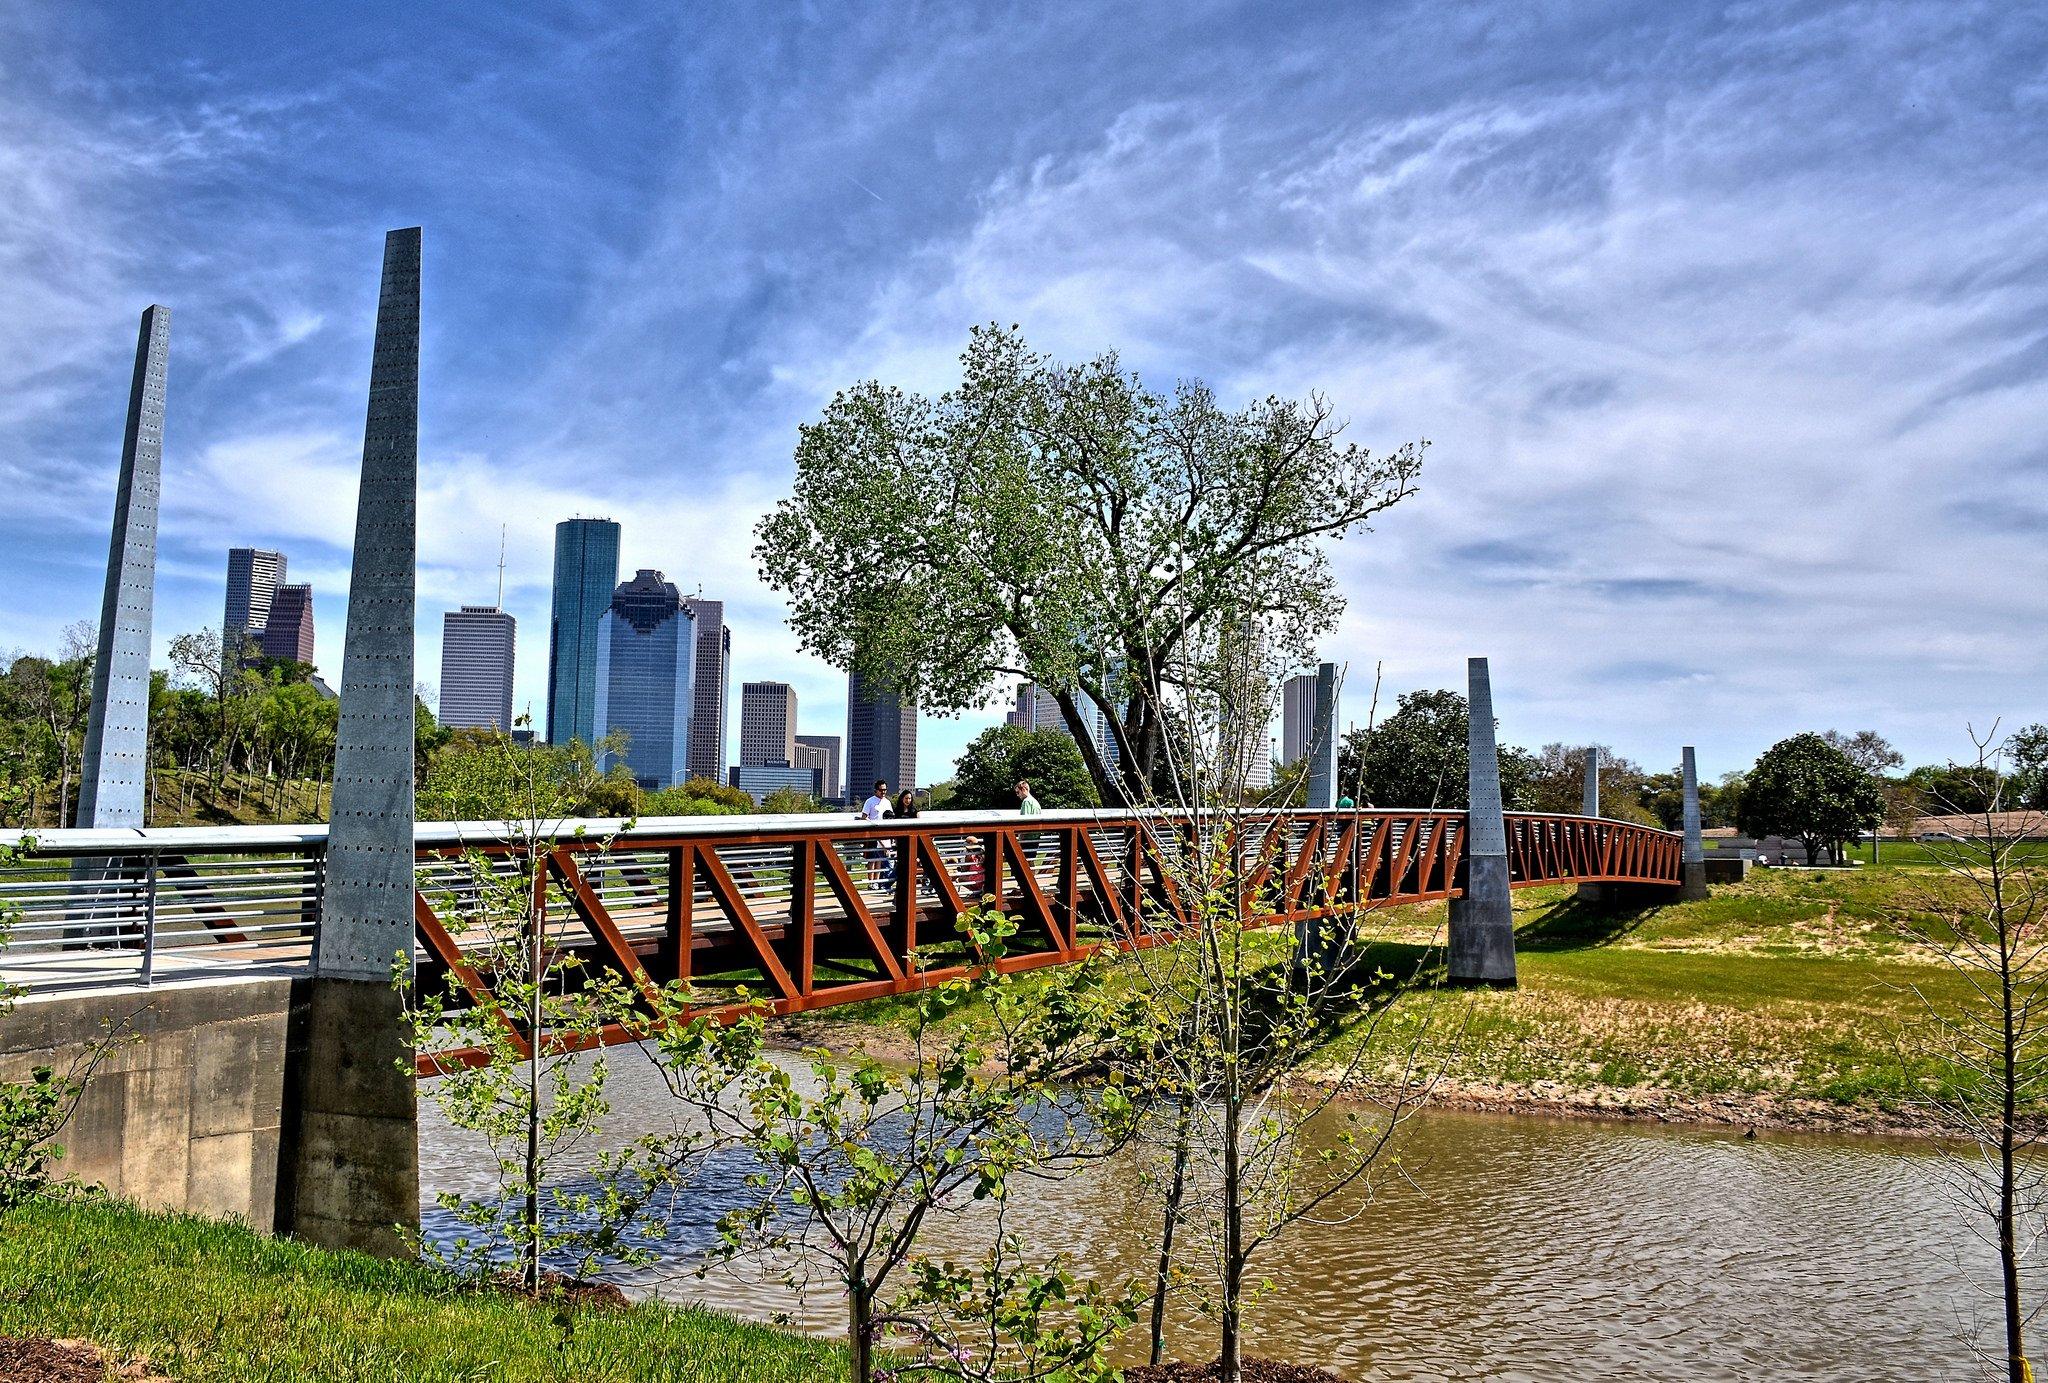 Houston architecture bridges cities City texas Night towers buildings 2048x1383